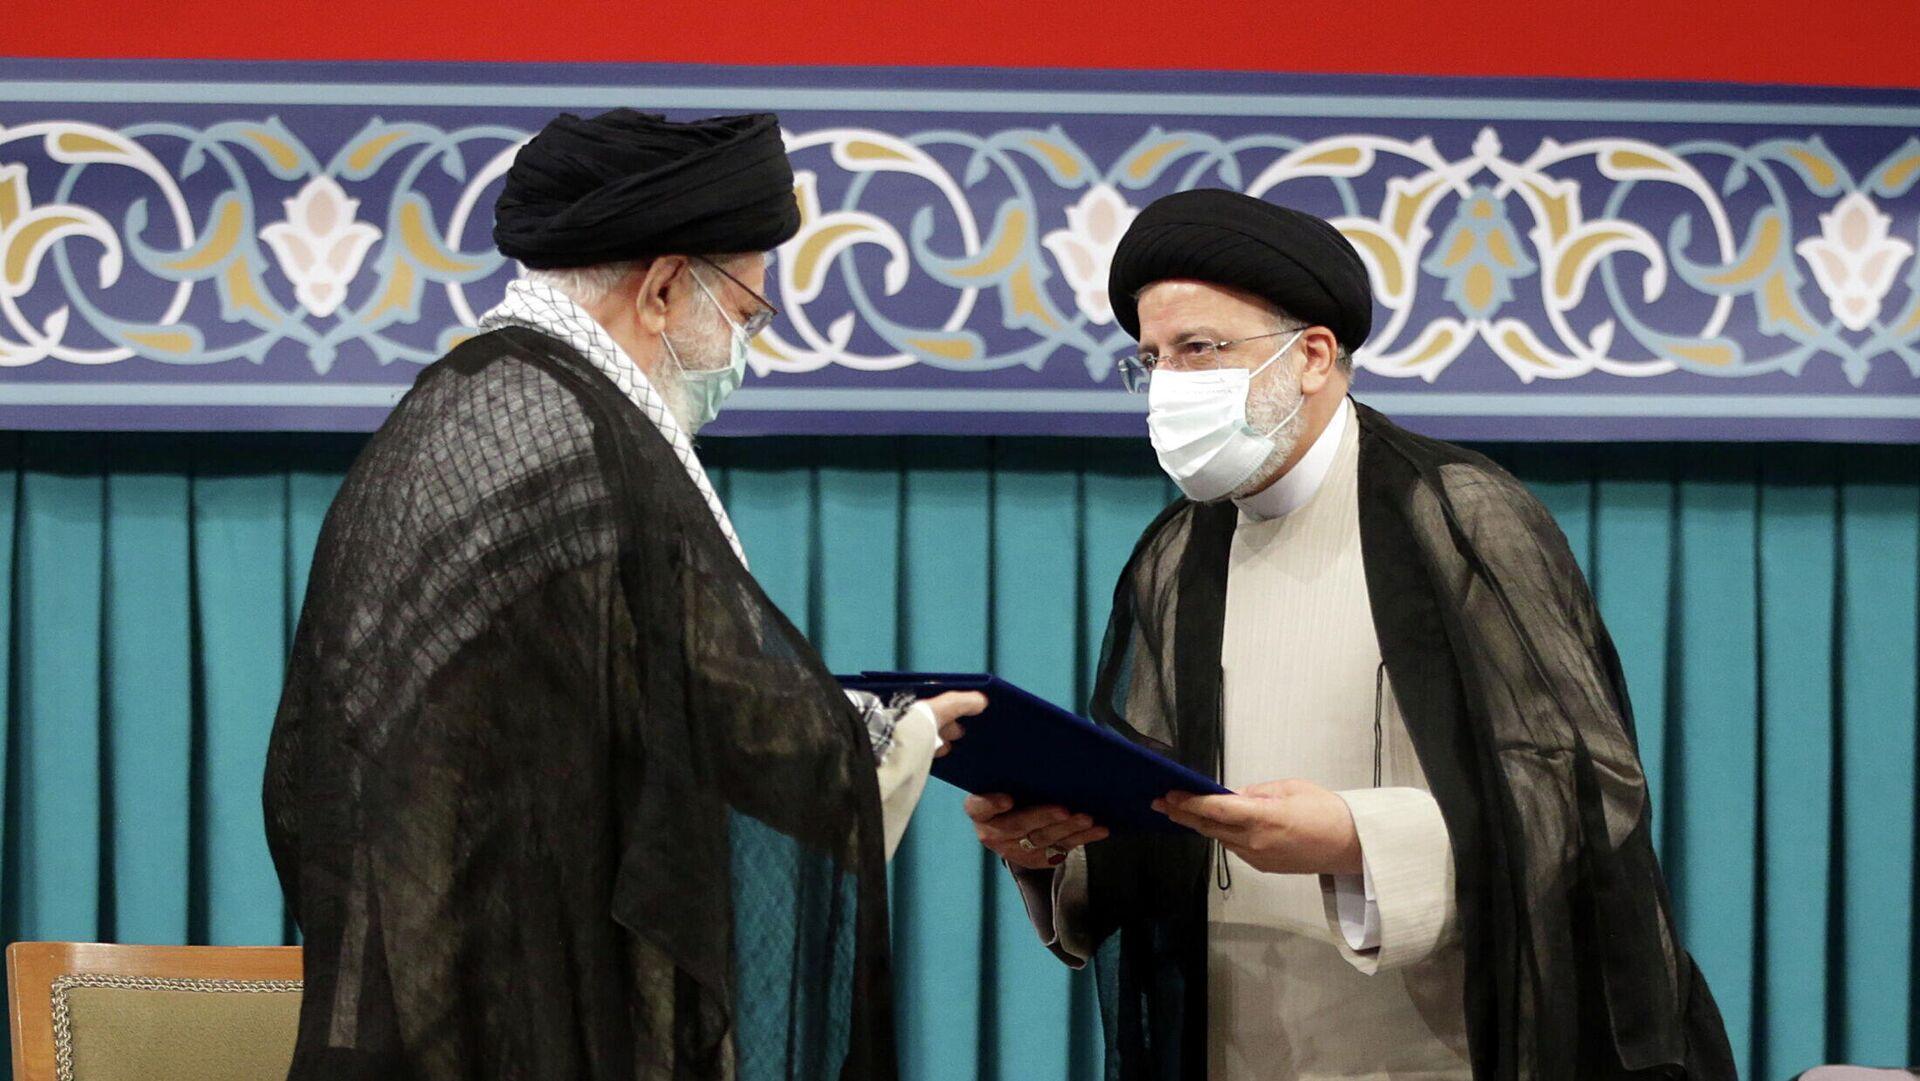 Nuevo presidente de Irán, Ebrahim Raisi, y el líder supremo de Irán, Alí Jamenei, - Sputnik Mundo, 1920, 04.08.2021